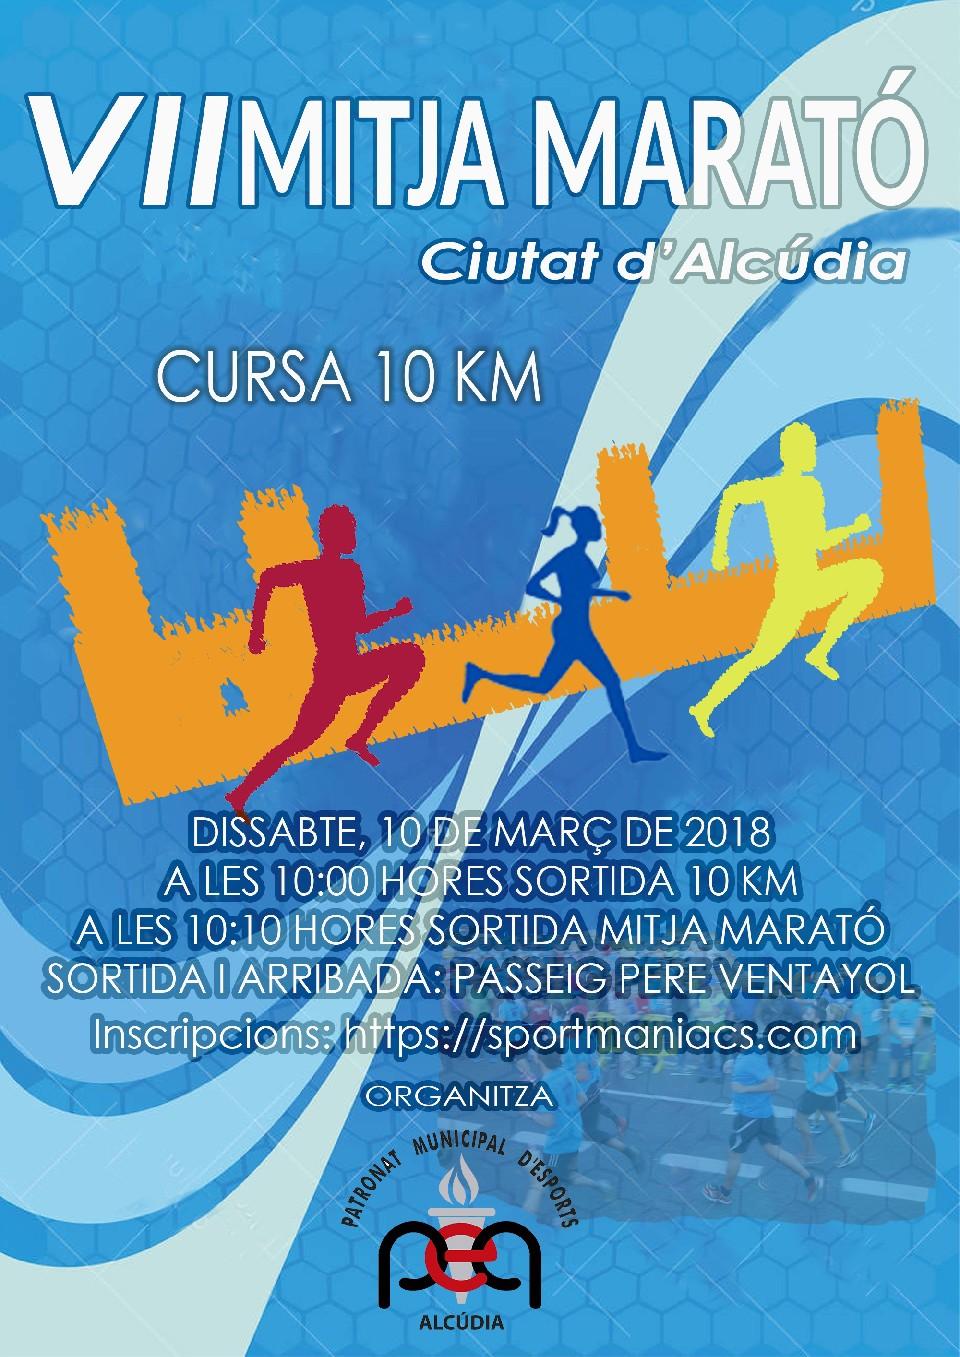 VII Mitja Marató Ciutat D'Alcúdia 2018